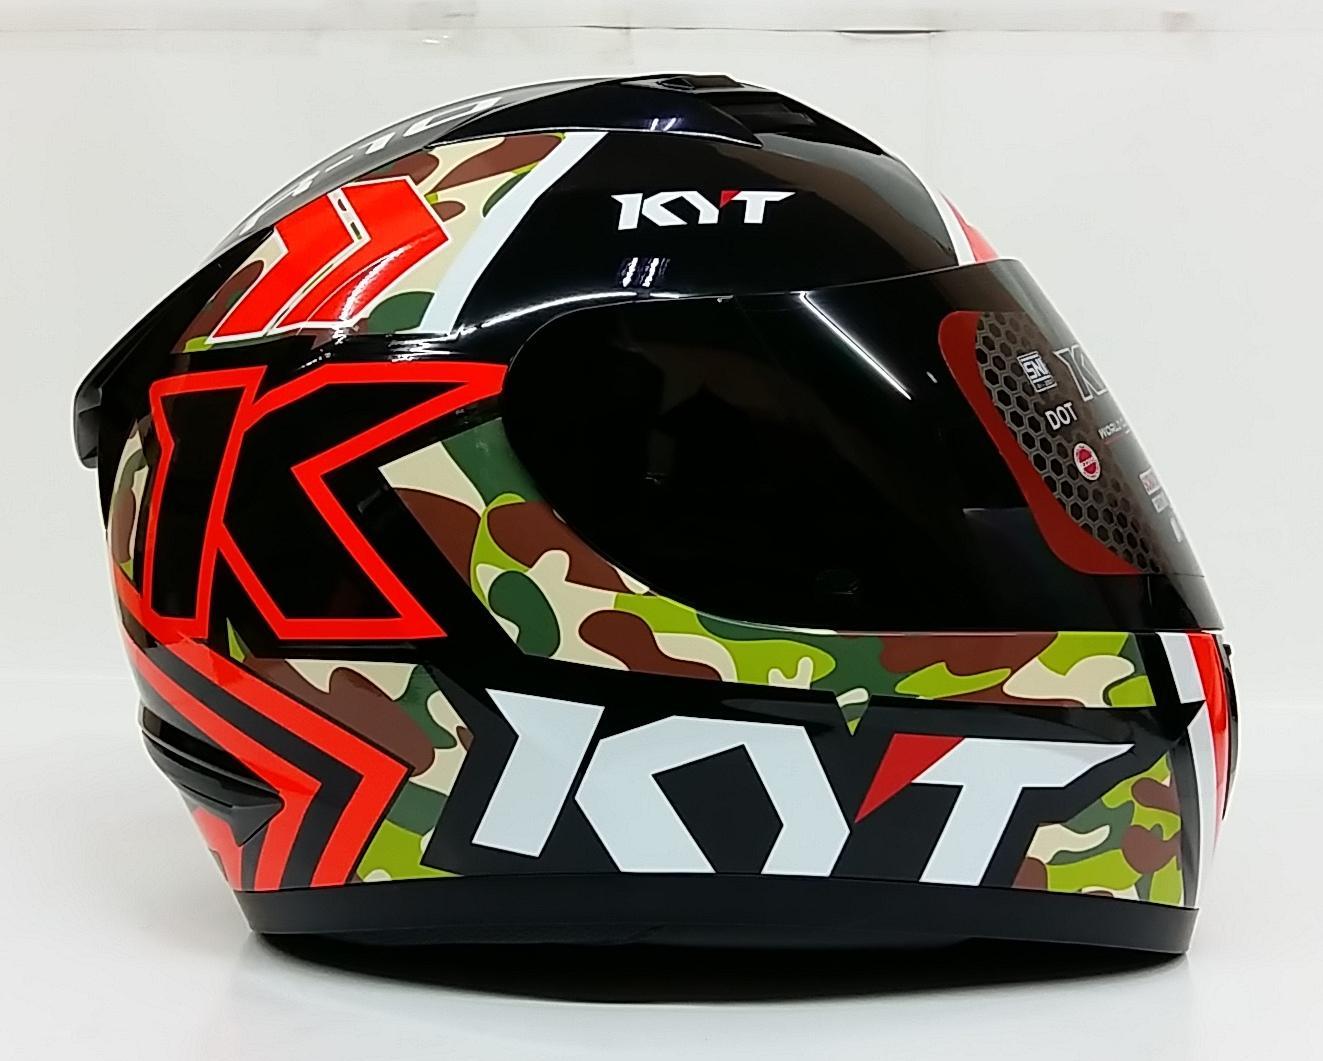 Gambar Produk Rinci KYT R10 #1 Helm Full Face - Bk Red Fluo Terkini